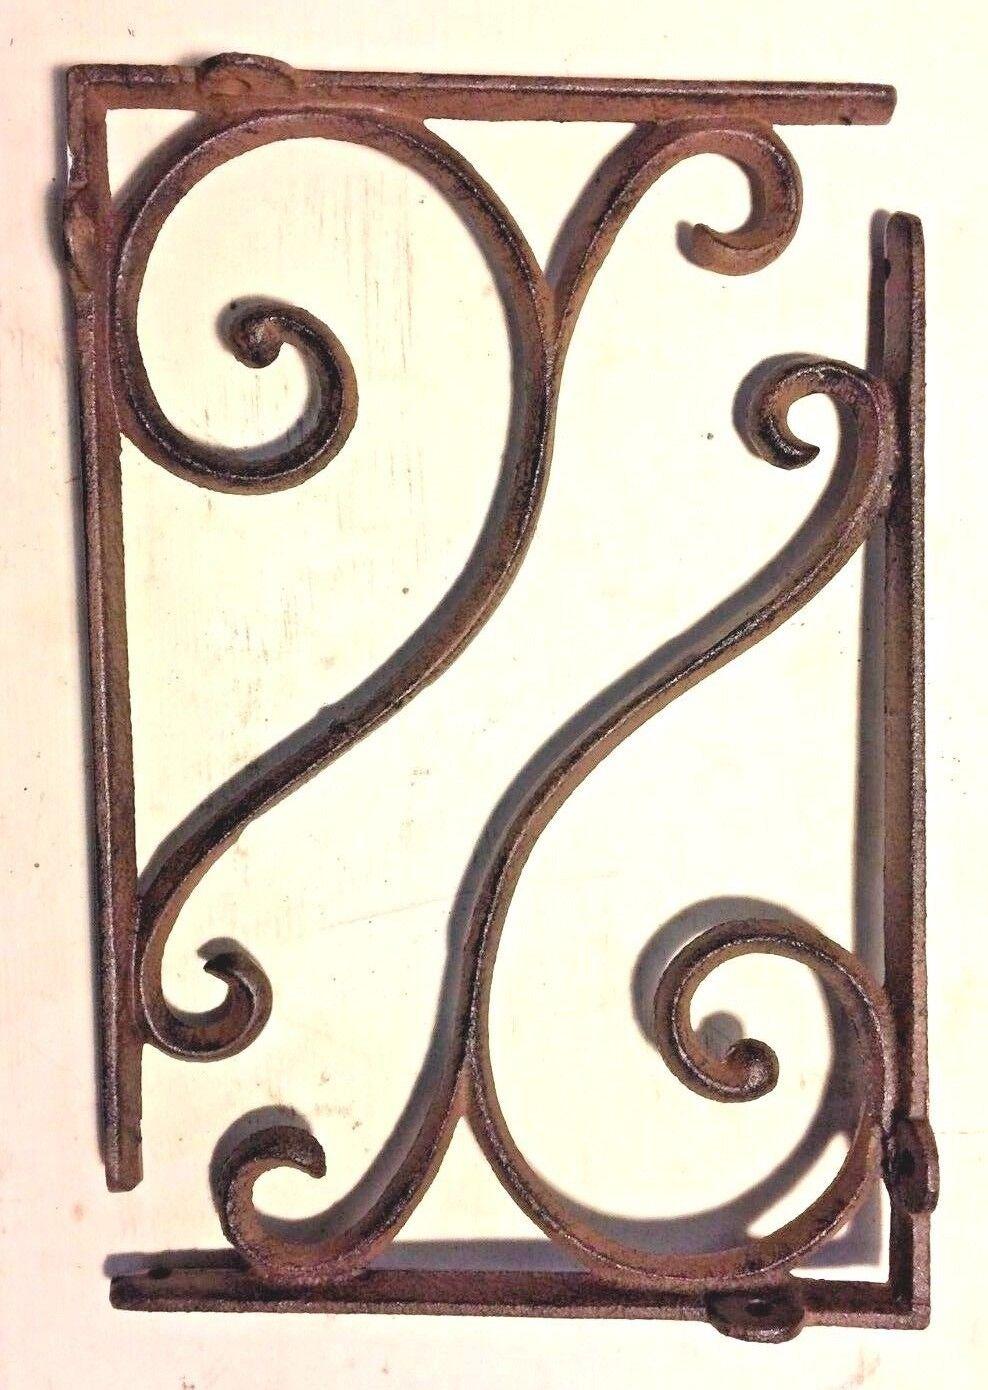 SET OF 4 LARGE RUSTIC  BROWN SCROLL BRACE//BRACKET vintage looking patina finish